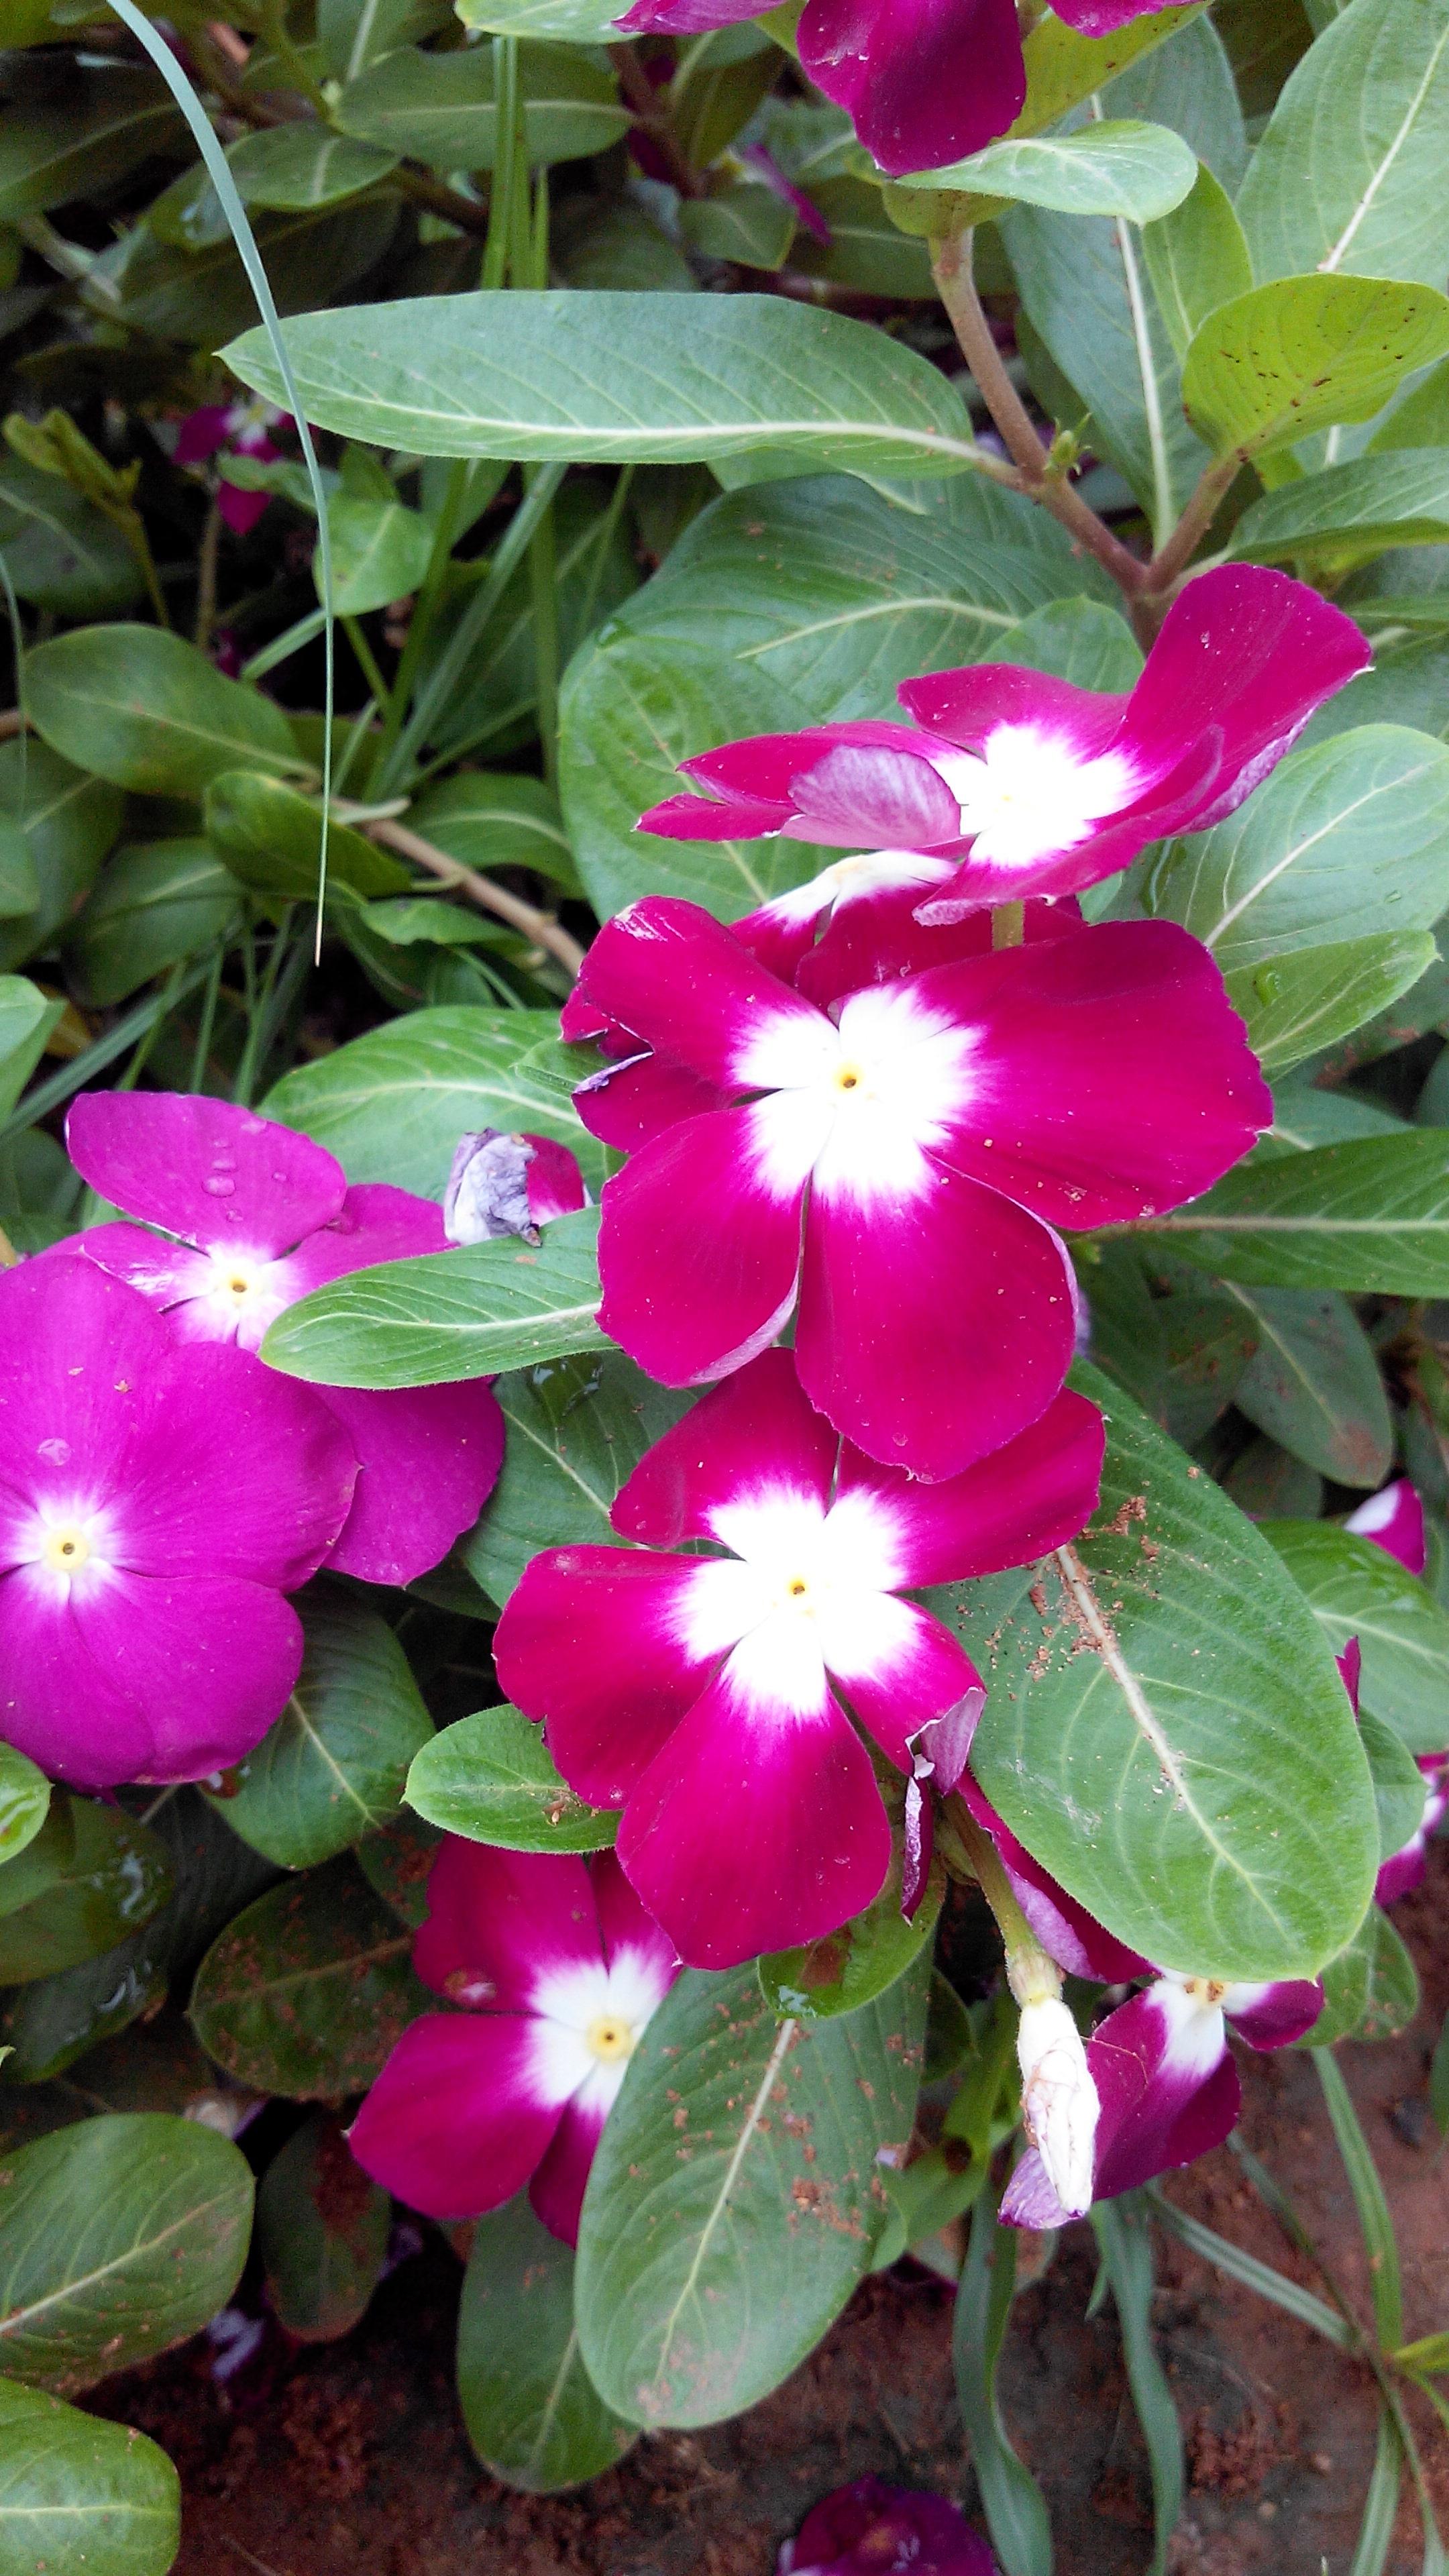 Filerare Flowers 05g Wikimedia Commons